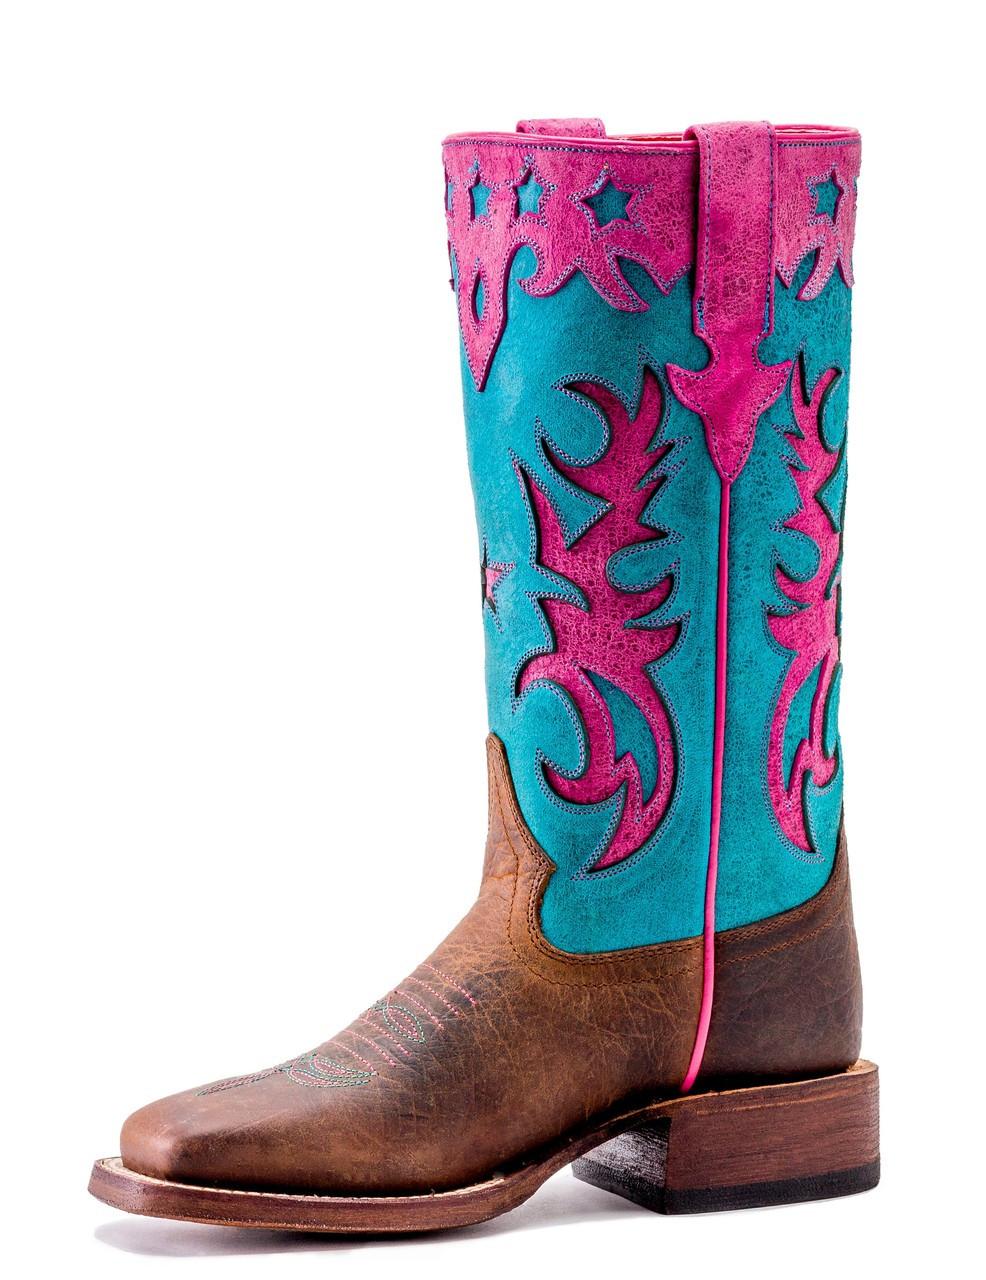 f008266a061 Macie Bean Kids Boots - Bone Mad Dog - Turquoise Sinsation